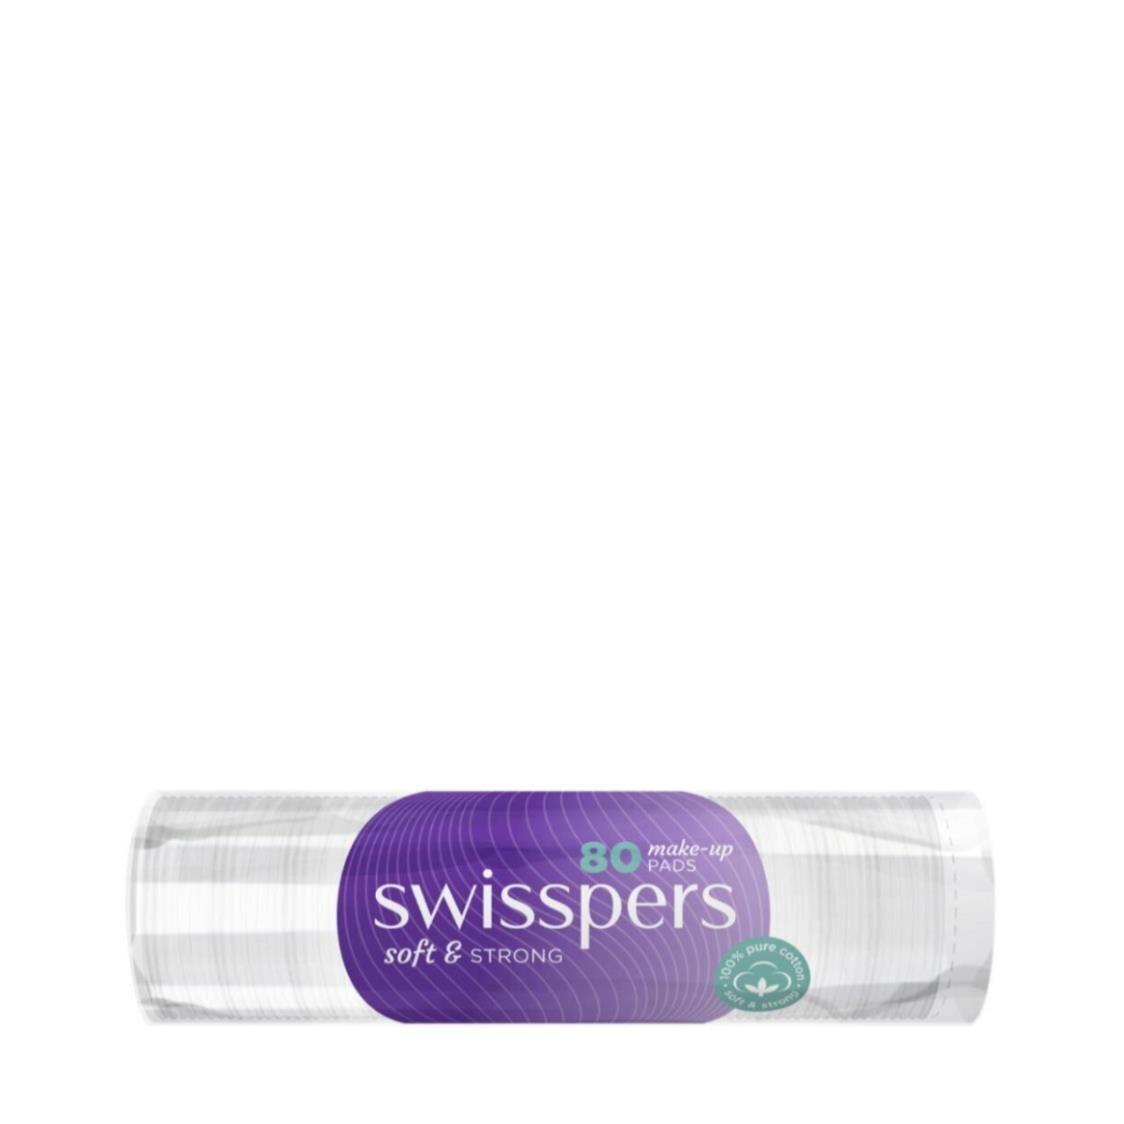 Swisspers Make Up Pads 80 Sheets